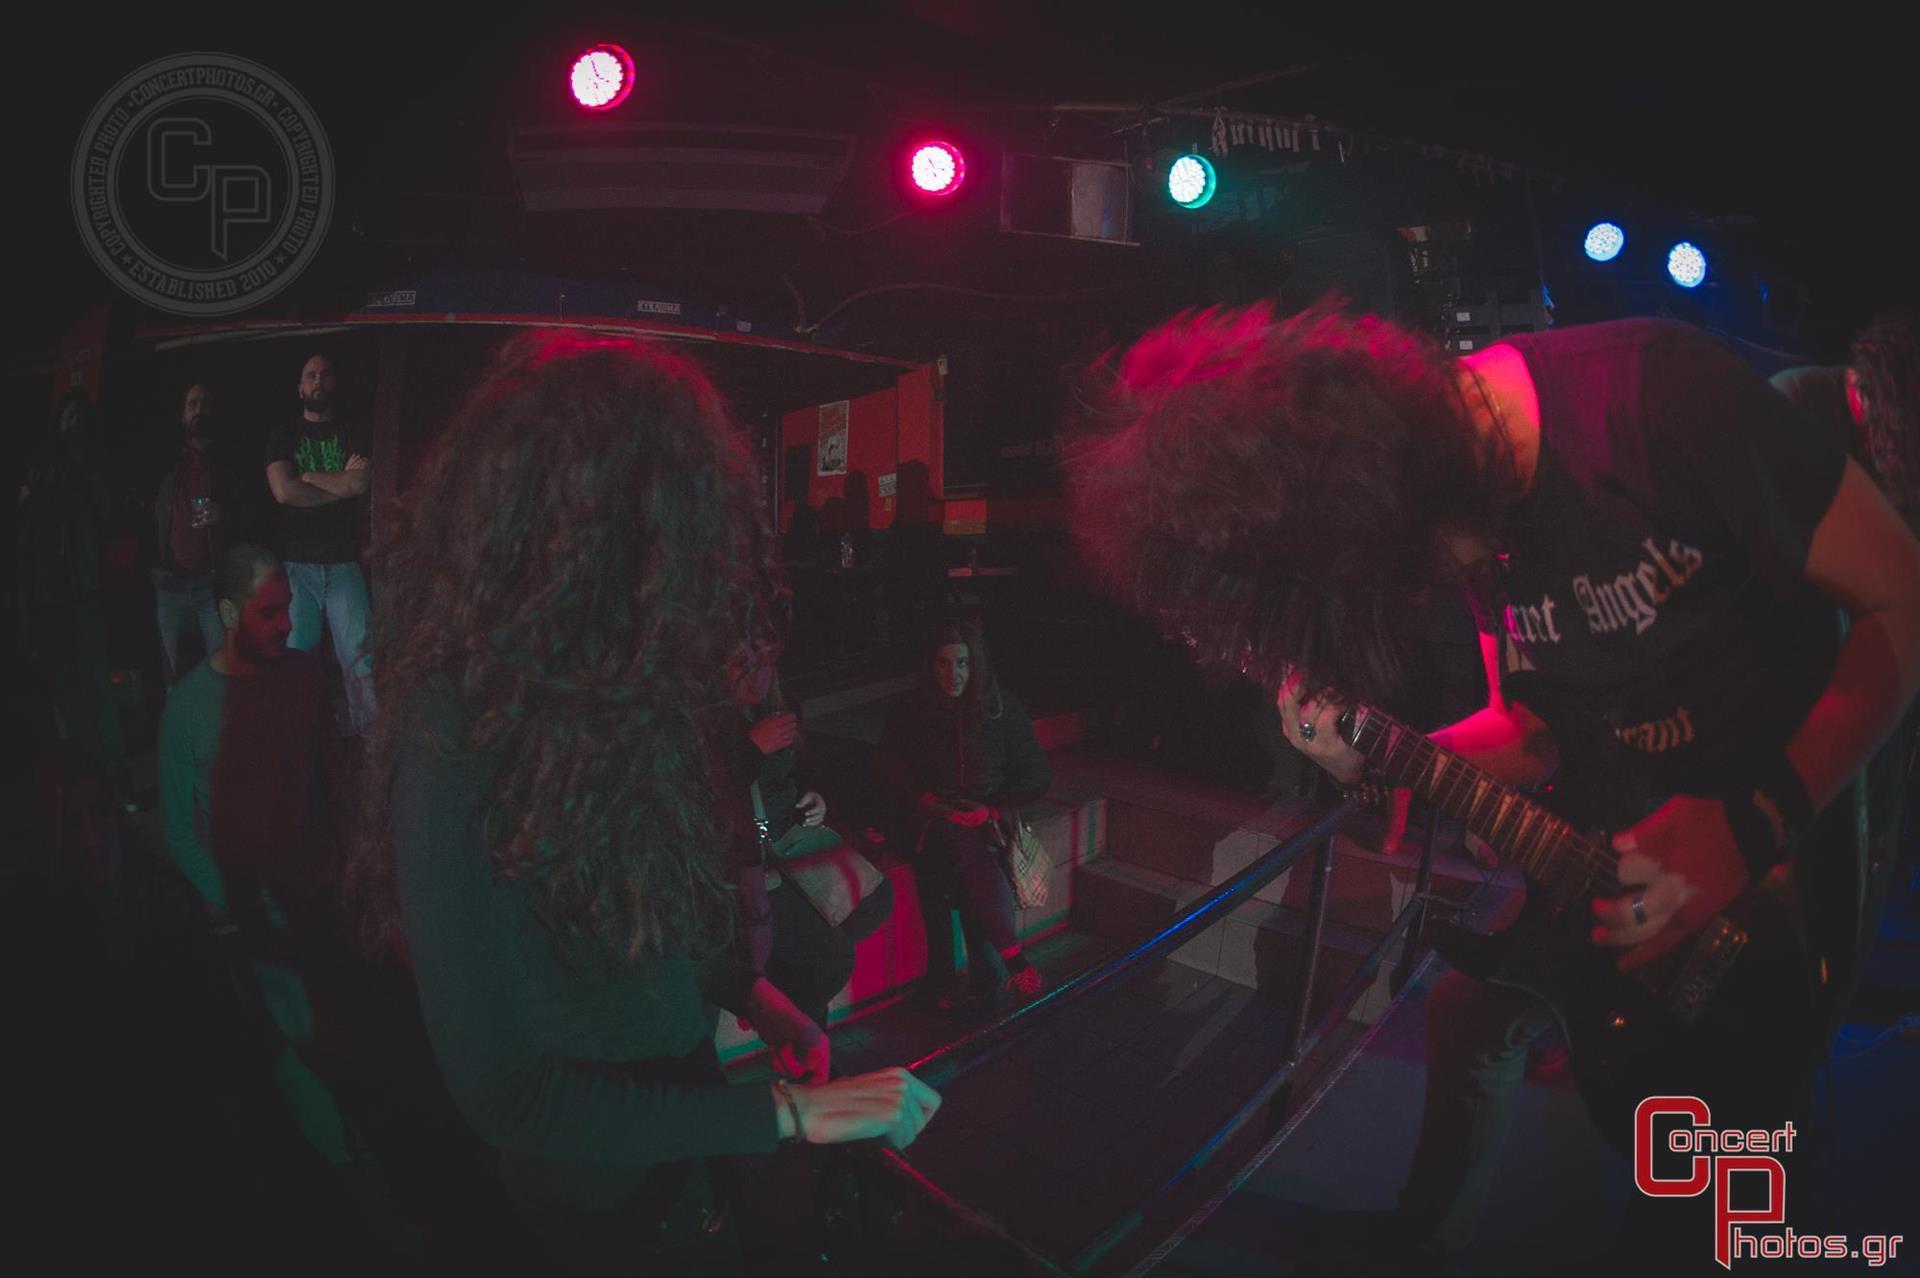 Battle Of The Bands Athens - Leg 3- photographer:  - ConcertPhotos - 20150104_2322_40